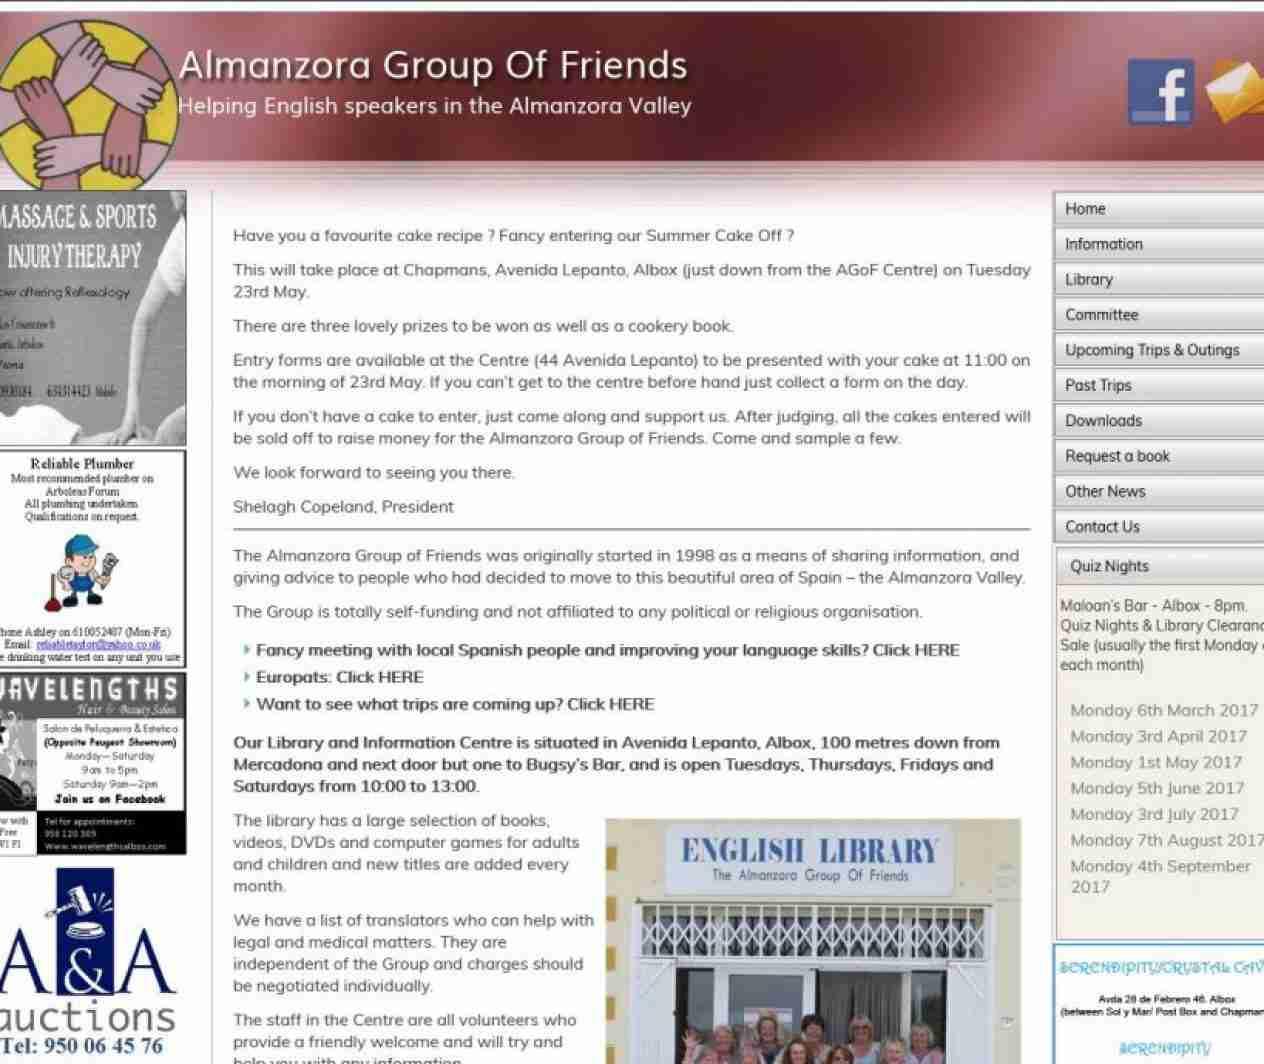 Almanzora Group of Friends